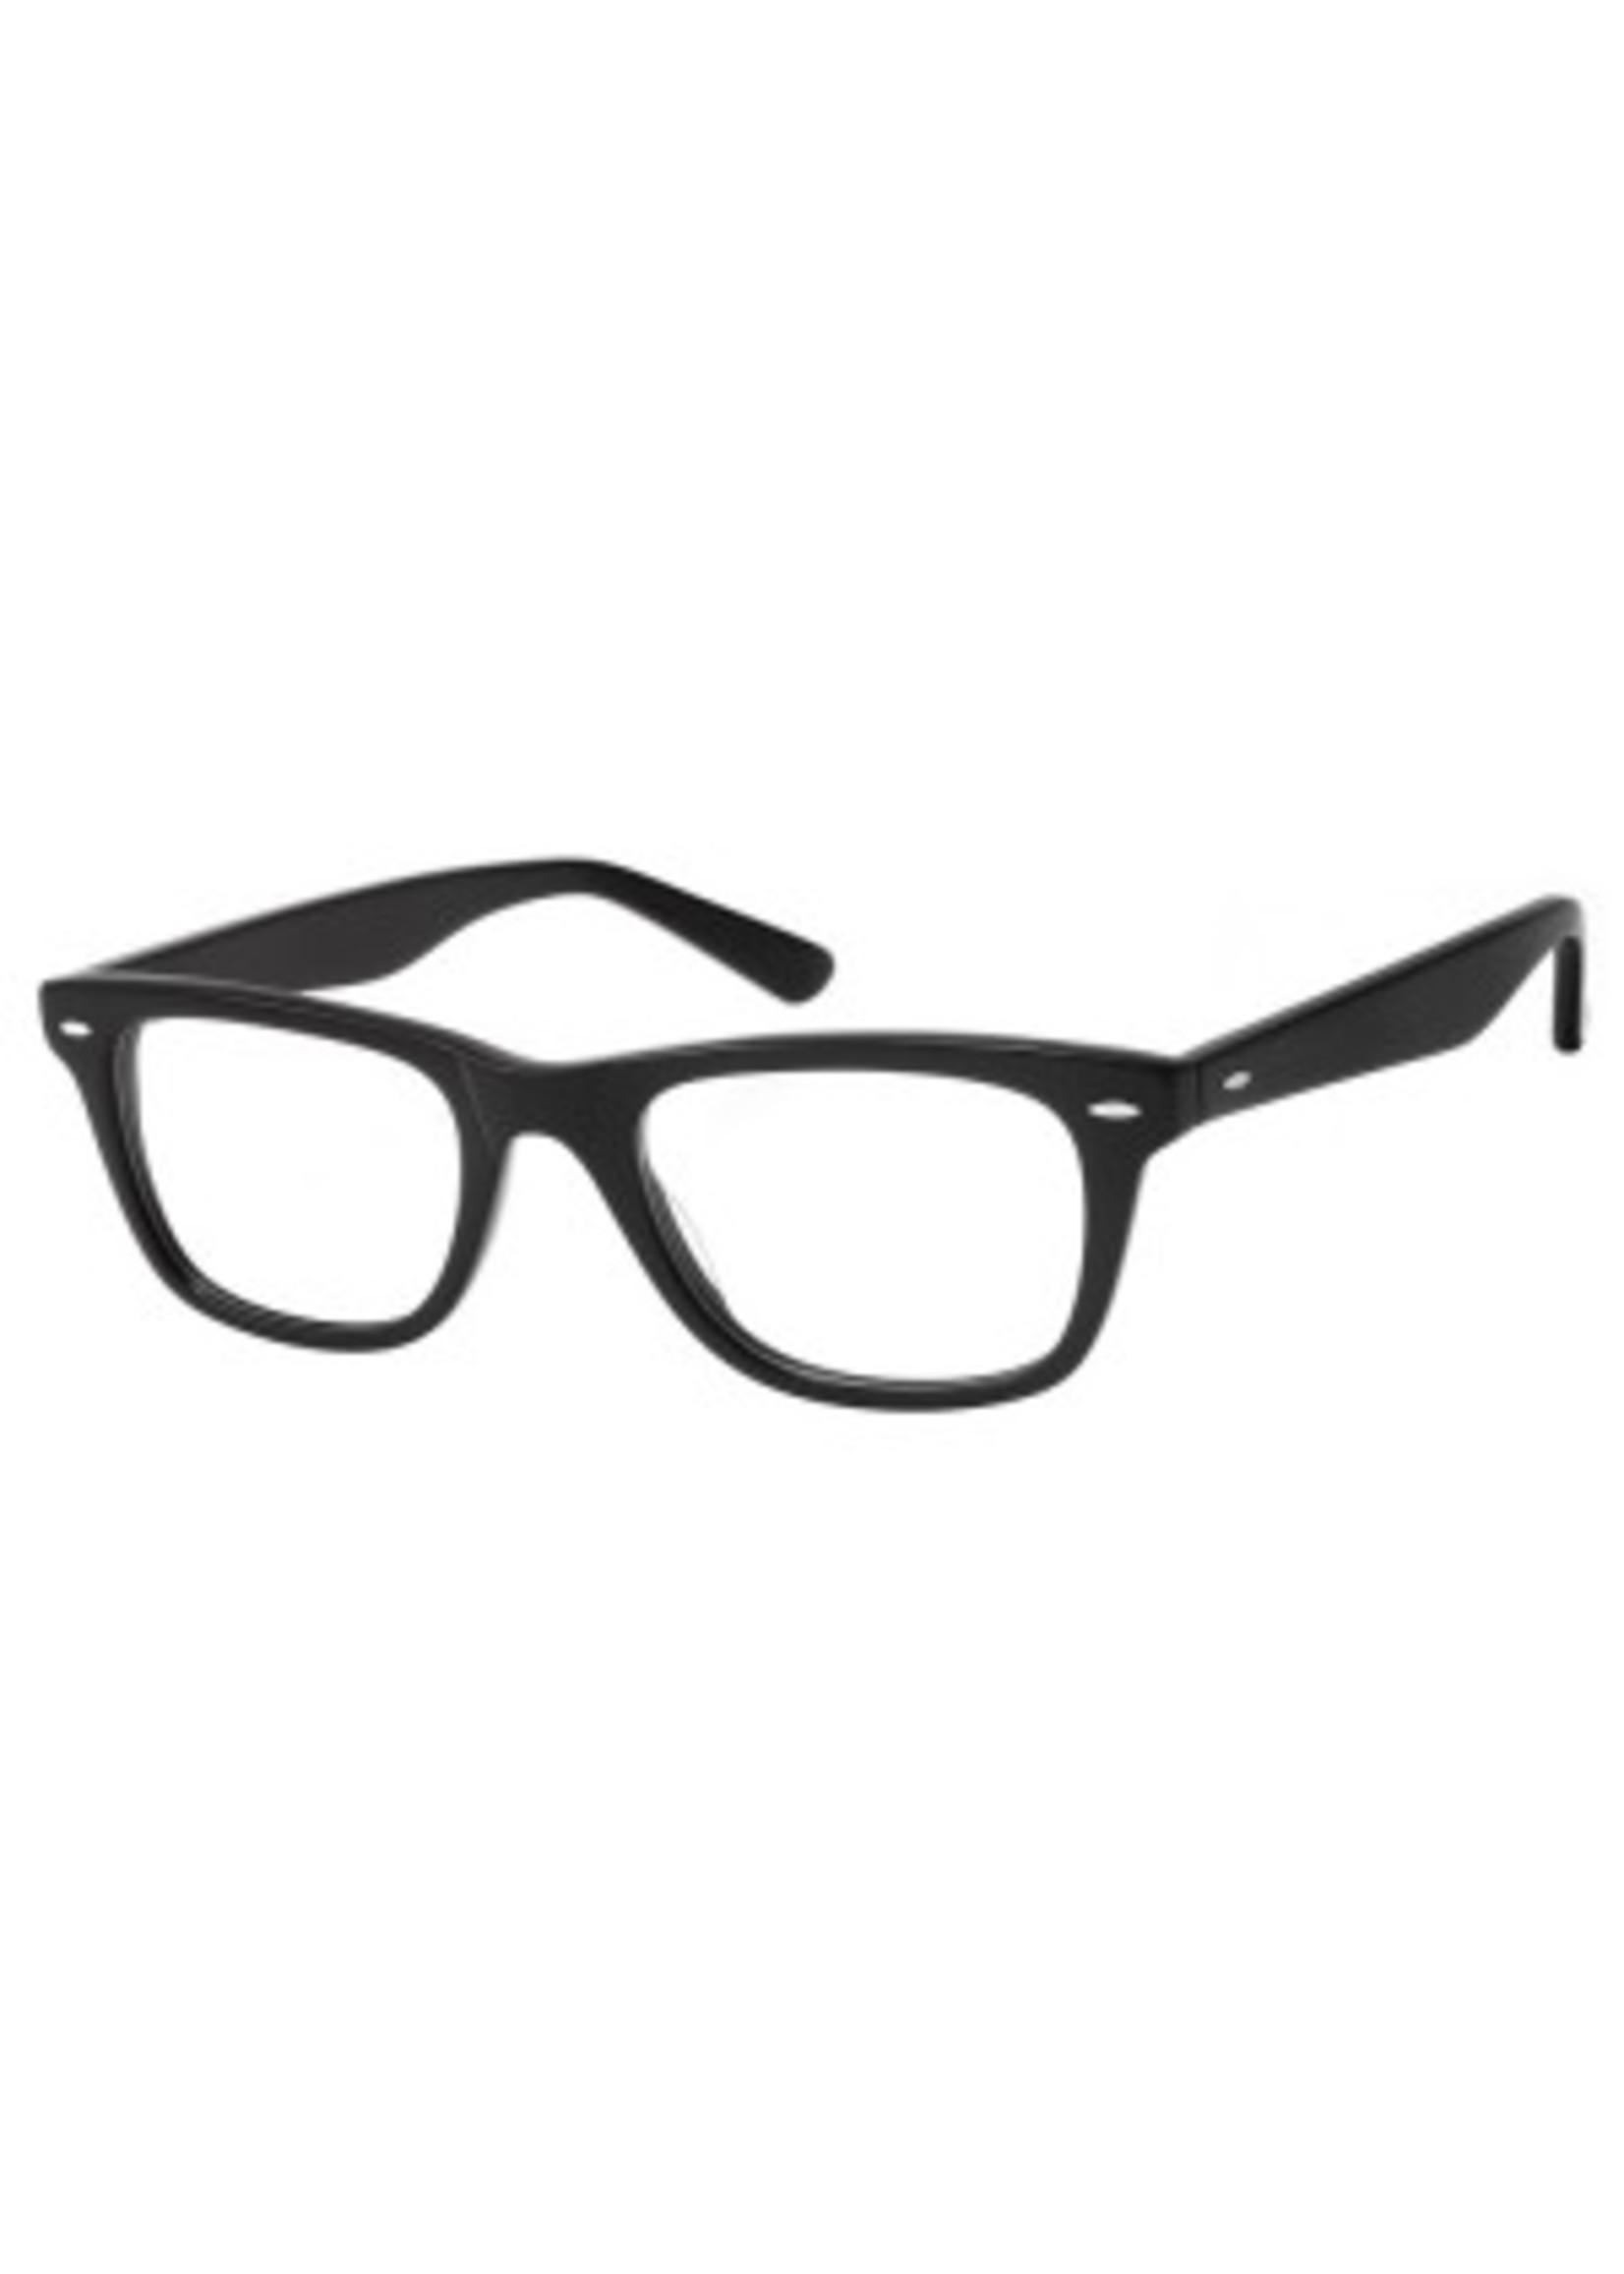 wayfarer leesbril in zwart